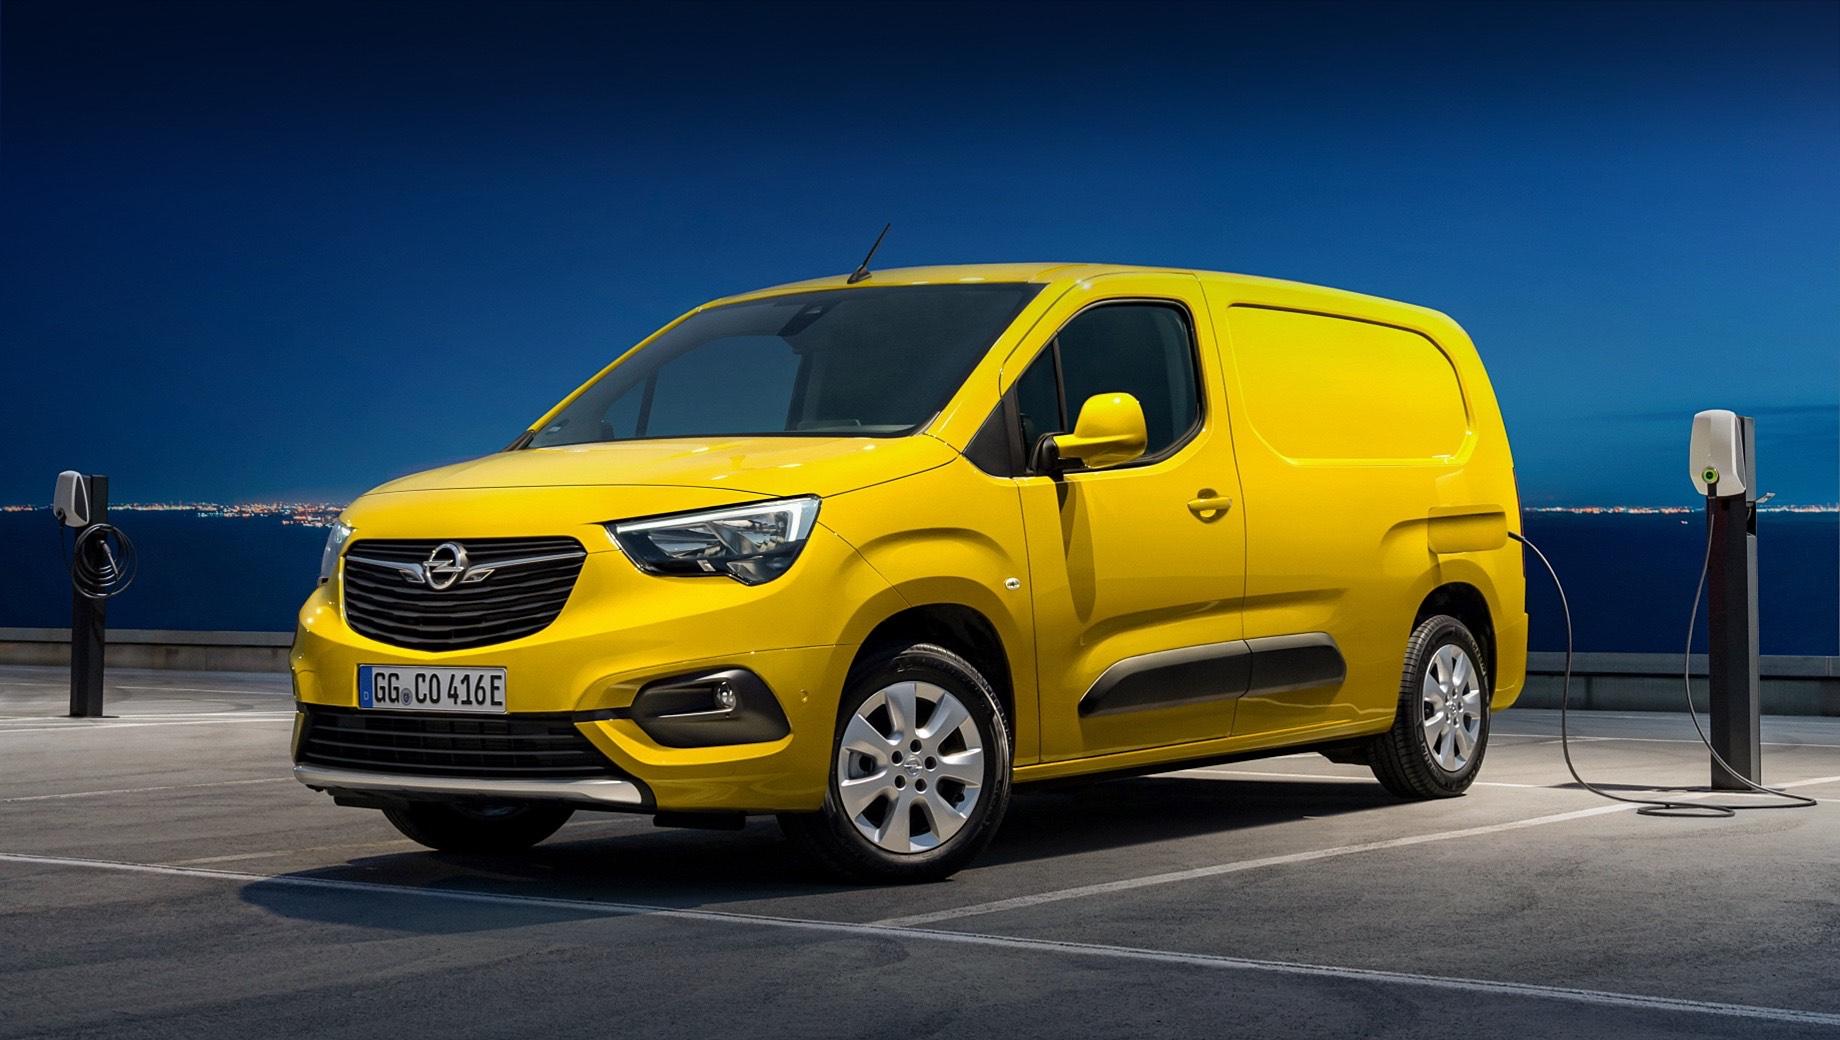 Opel combo,Opel combo-e,Vauxhall combo-e. Базовый Combo-e в длину насчитывает 4,4 м (колёсная база — 2785 мм), а объём его кузова варьируется от 3,3 до 3,8 м3. В исполнении XL расстояние от носа до хвоста увеличивается до 4,75 м (2975 мм), а объём грузового отсека — до 4,4 м3. Грузоподъёмность в обоих случаях — 800 кг.